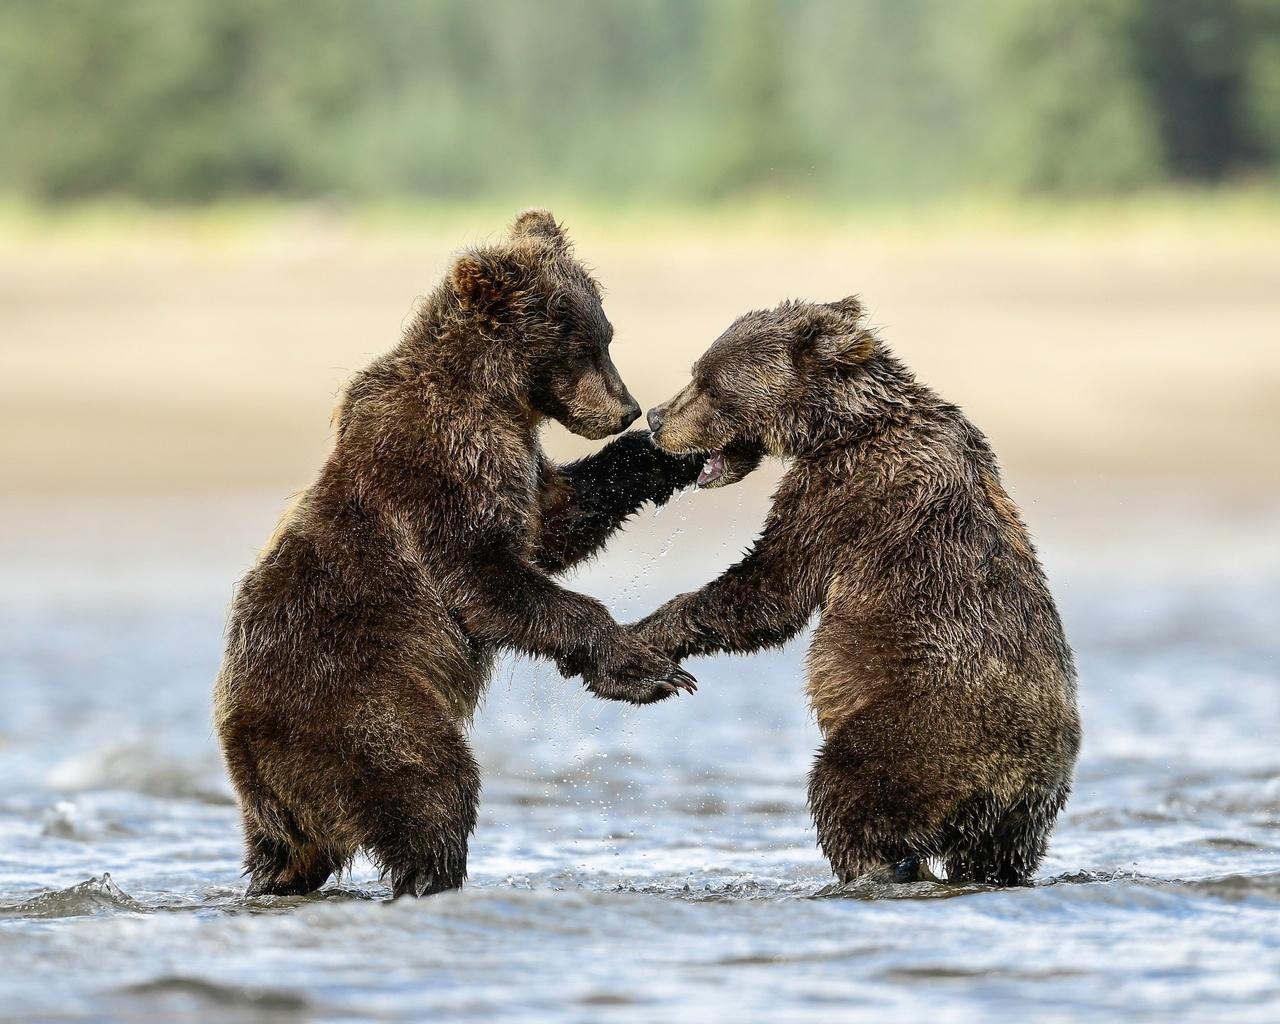 животные, хищники, медвежата, детёныши, пара, природа, вода